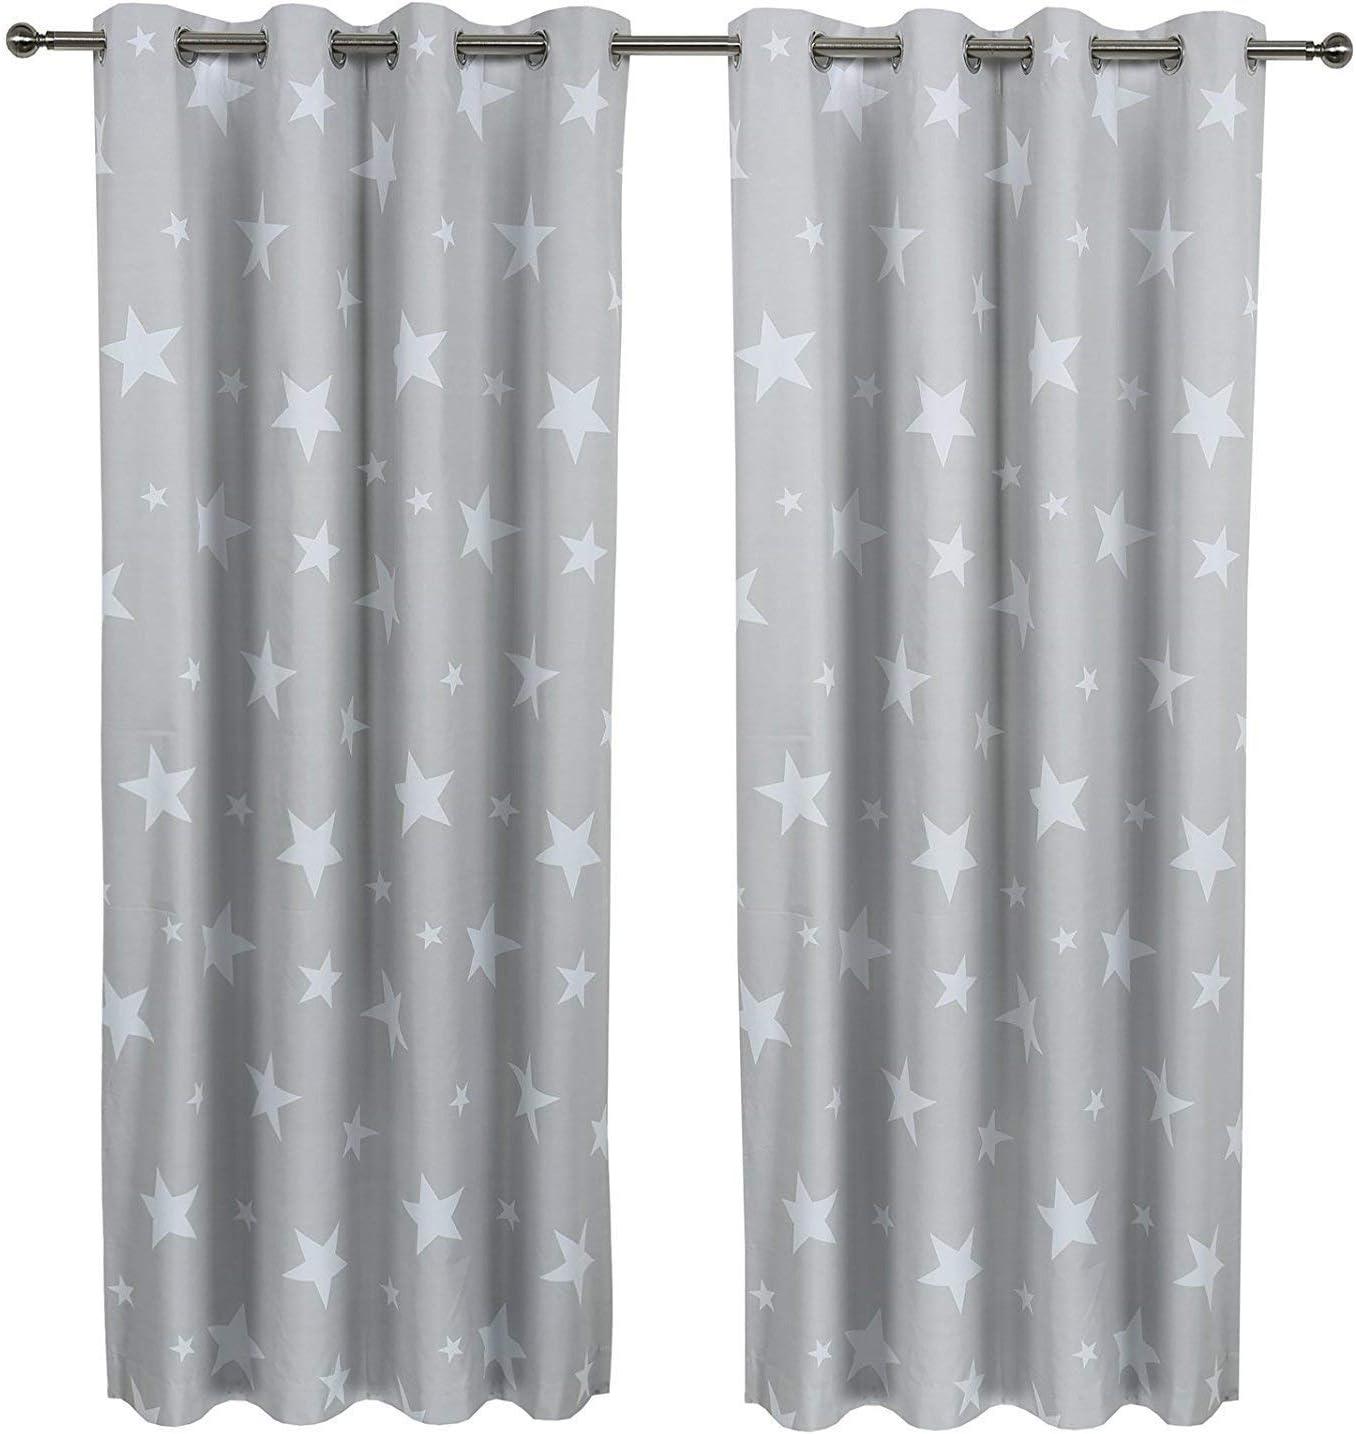 "SHERWOOD 1 Pair Children Star Curtain Coated Blockout Eyelet Window Drape Panel Kids Bed Room Livingroom 46"" Width 54"" Drop"